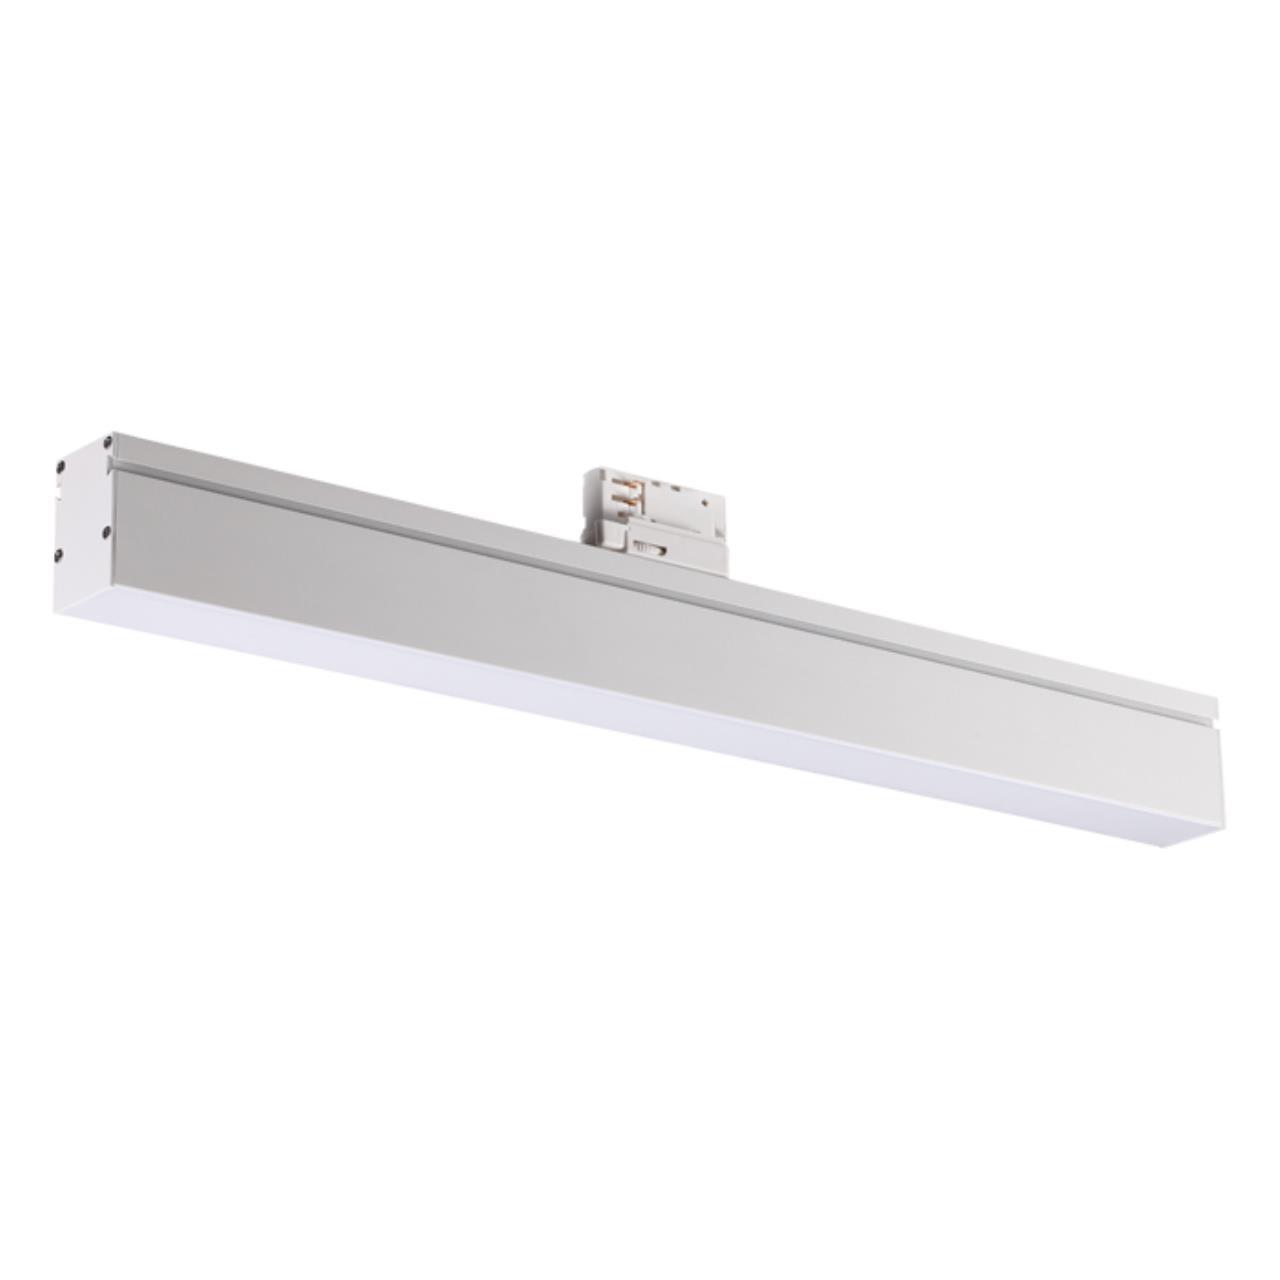 358187 PORT NT19 021 белый Трехфазный трековый светодиодный светильник IP20 4000K 18W 100-240V ITER